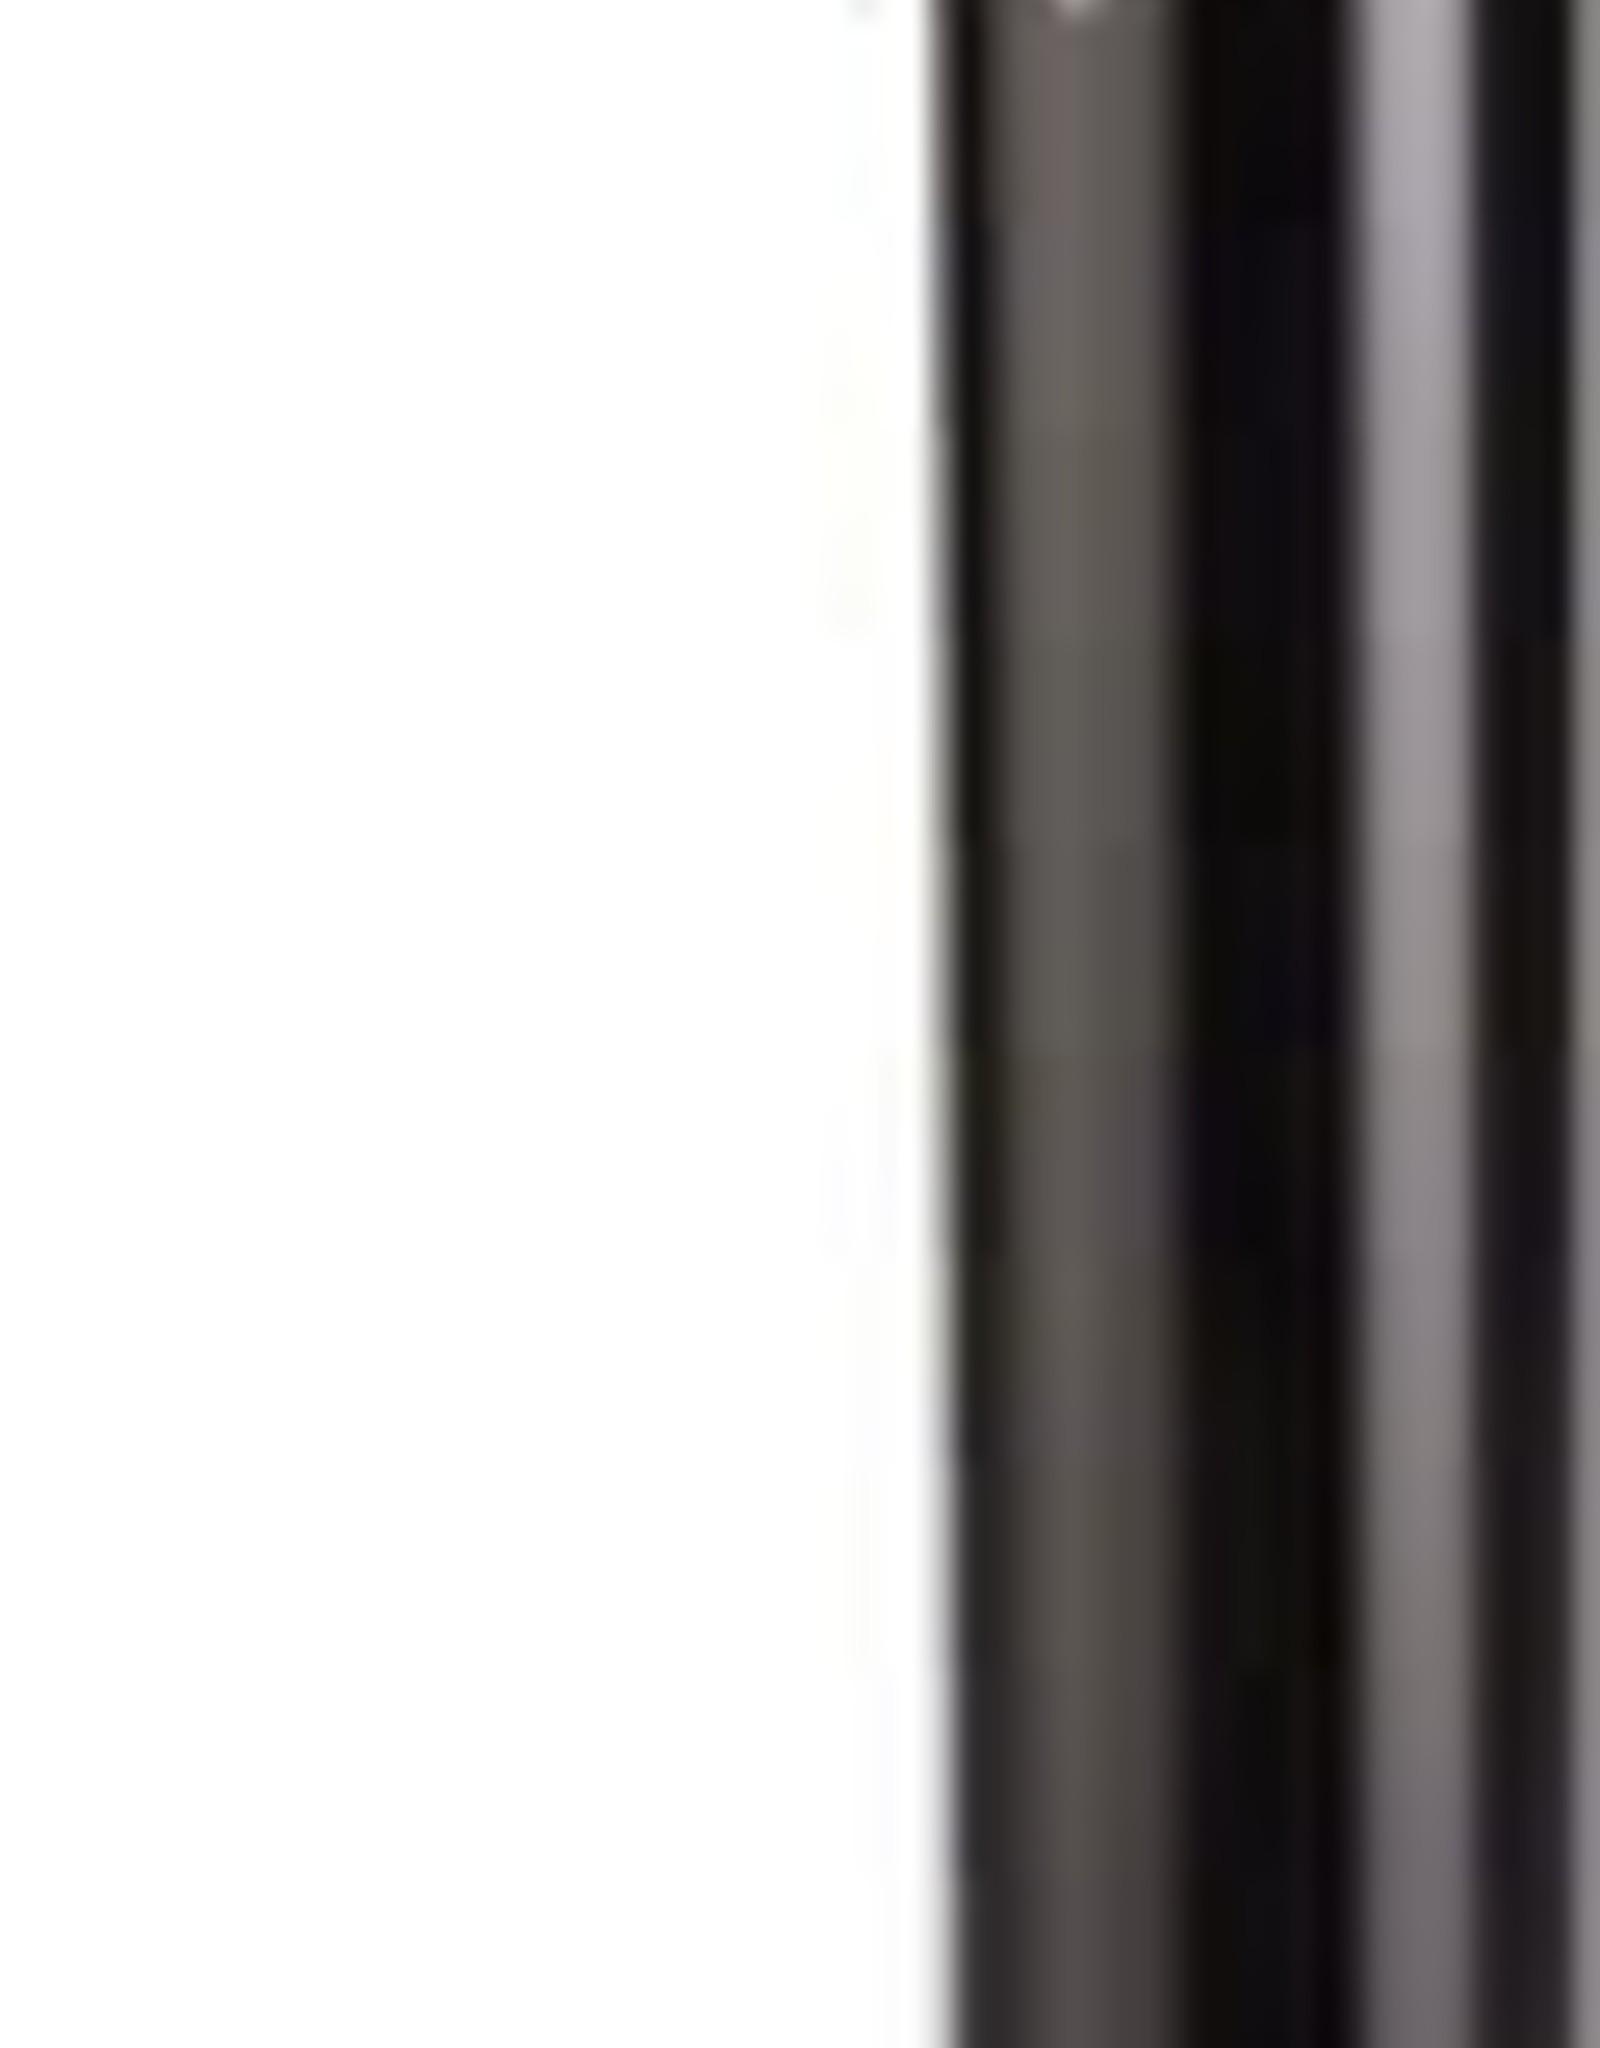 Kalloy Uno 602 Seatpost, 30.9 x 350mm, Black